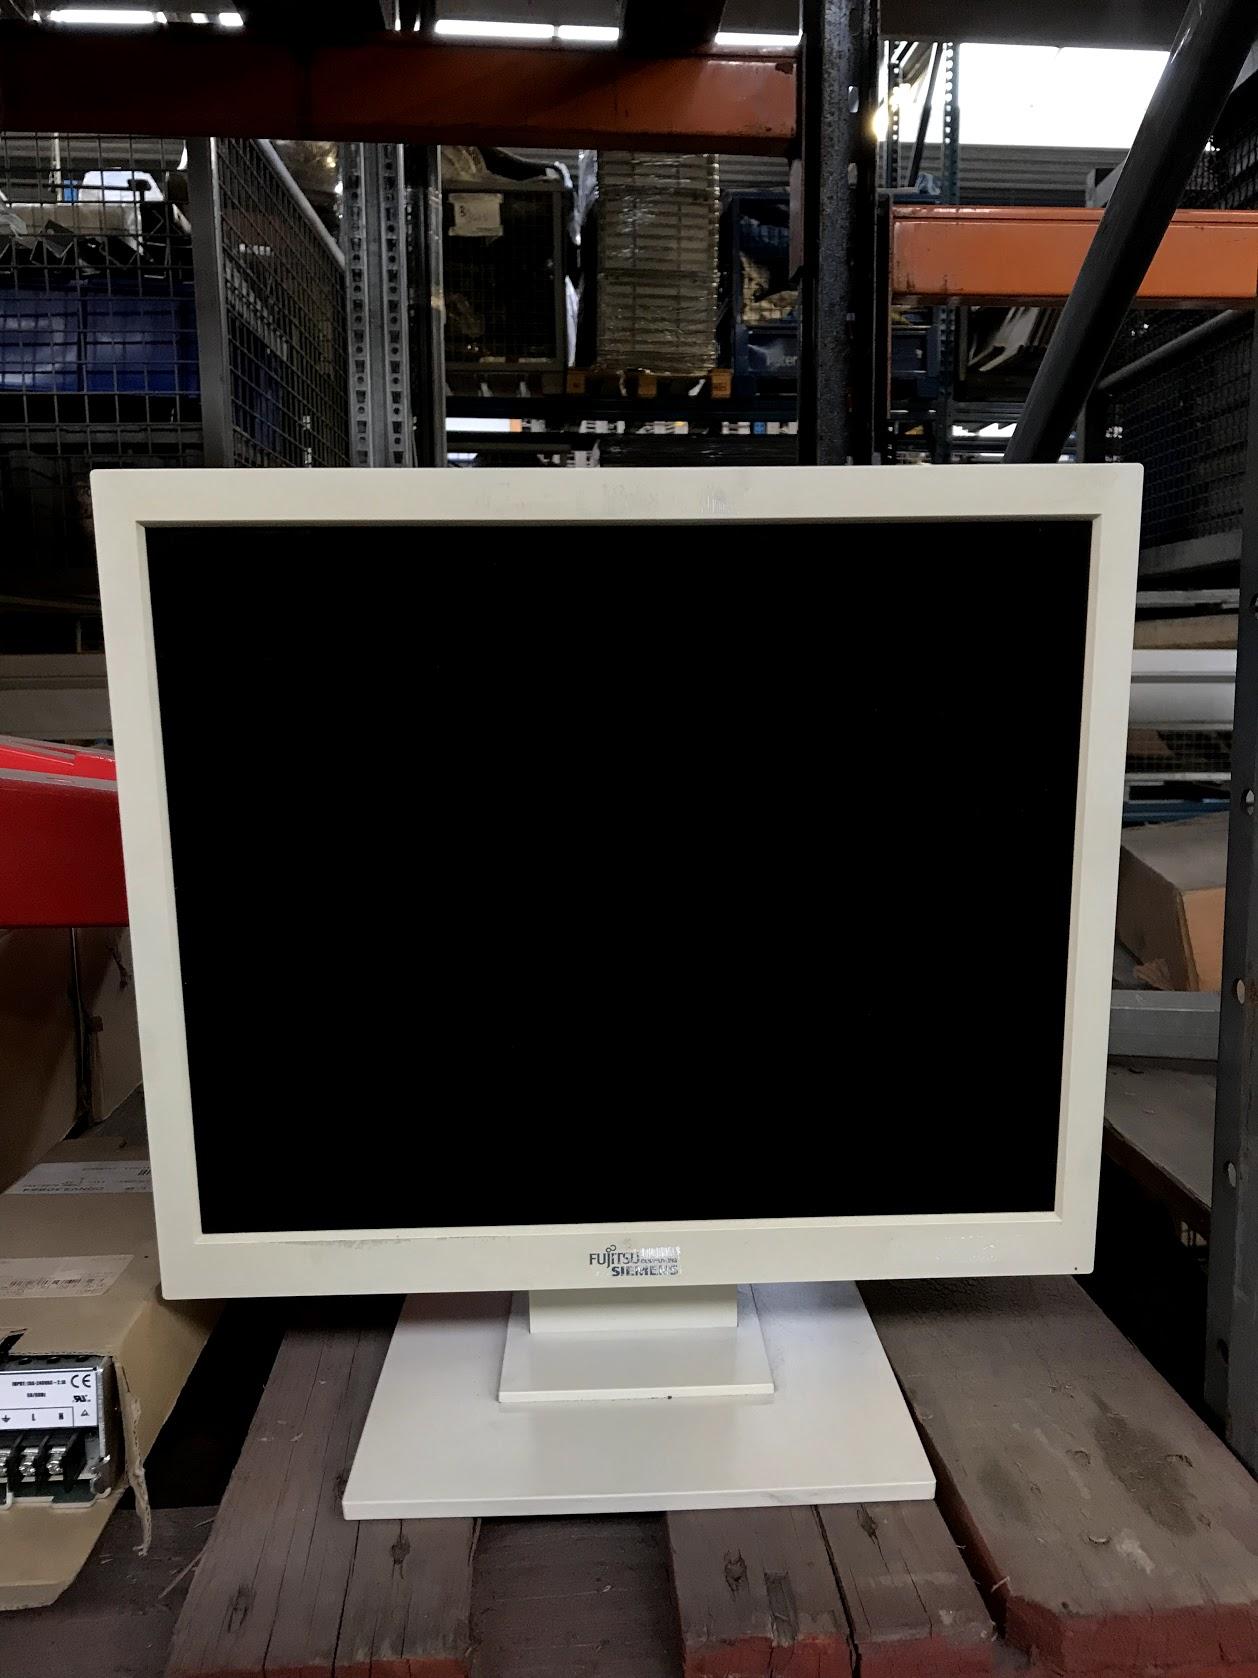 Fujitsu Computer Siemens monitor